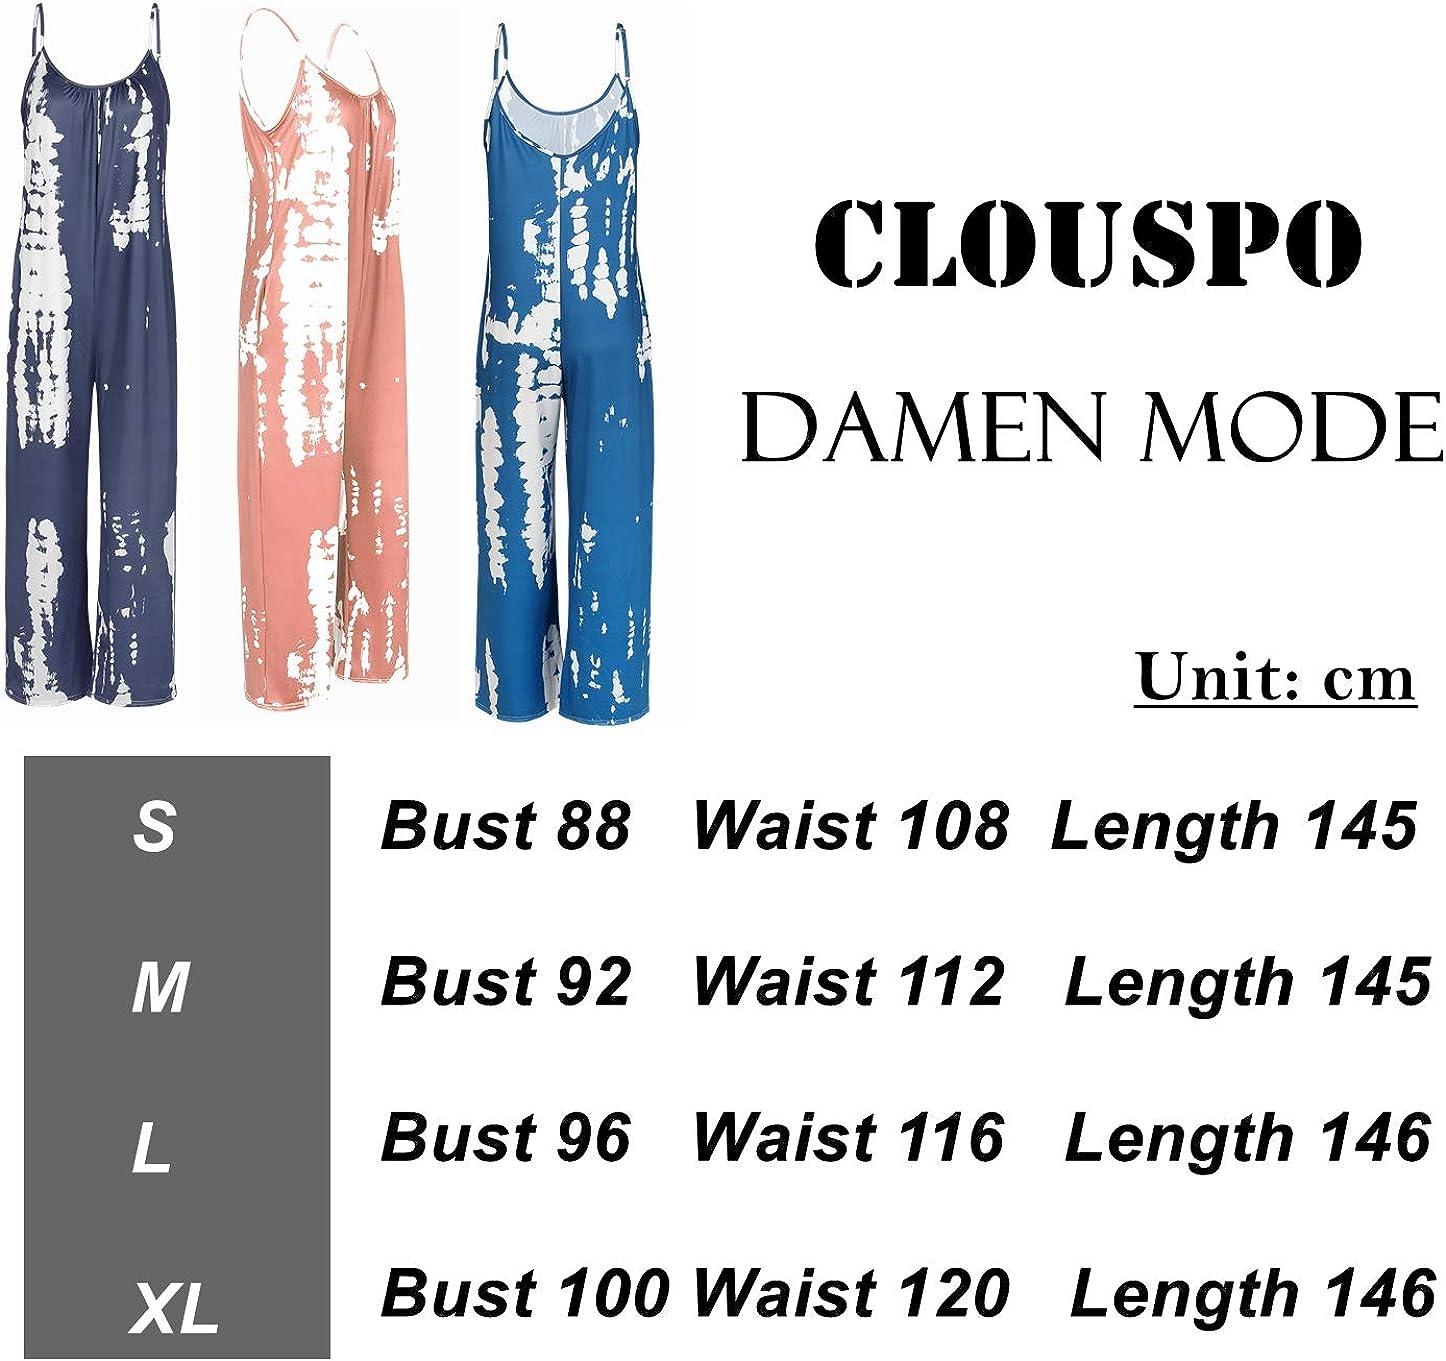 CLOUSPO Damen Jumpsuit Lose /Ärmellos Sommer Lang Overall Einteiler Hosenanzug Romper Playsuit